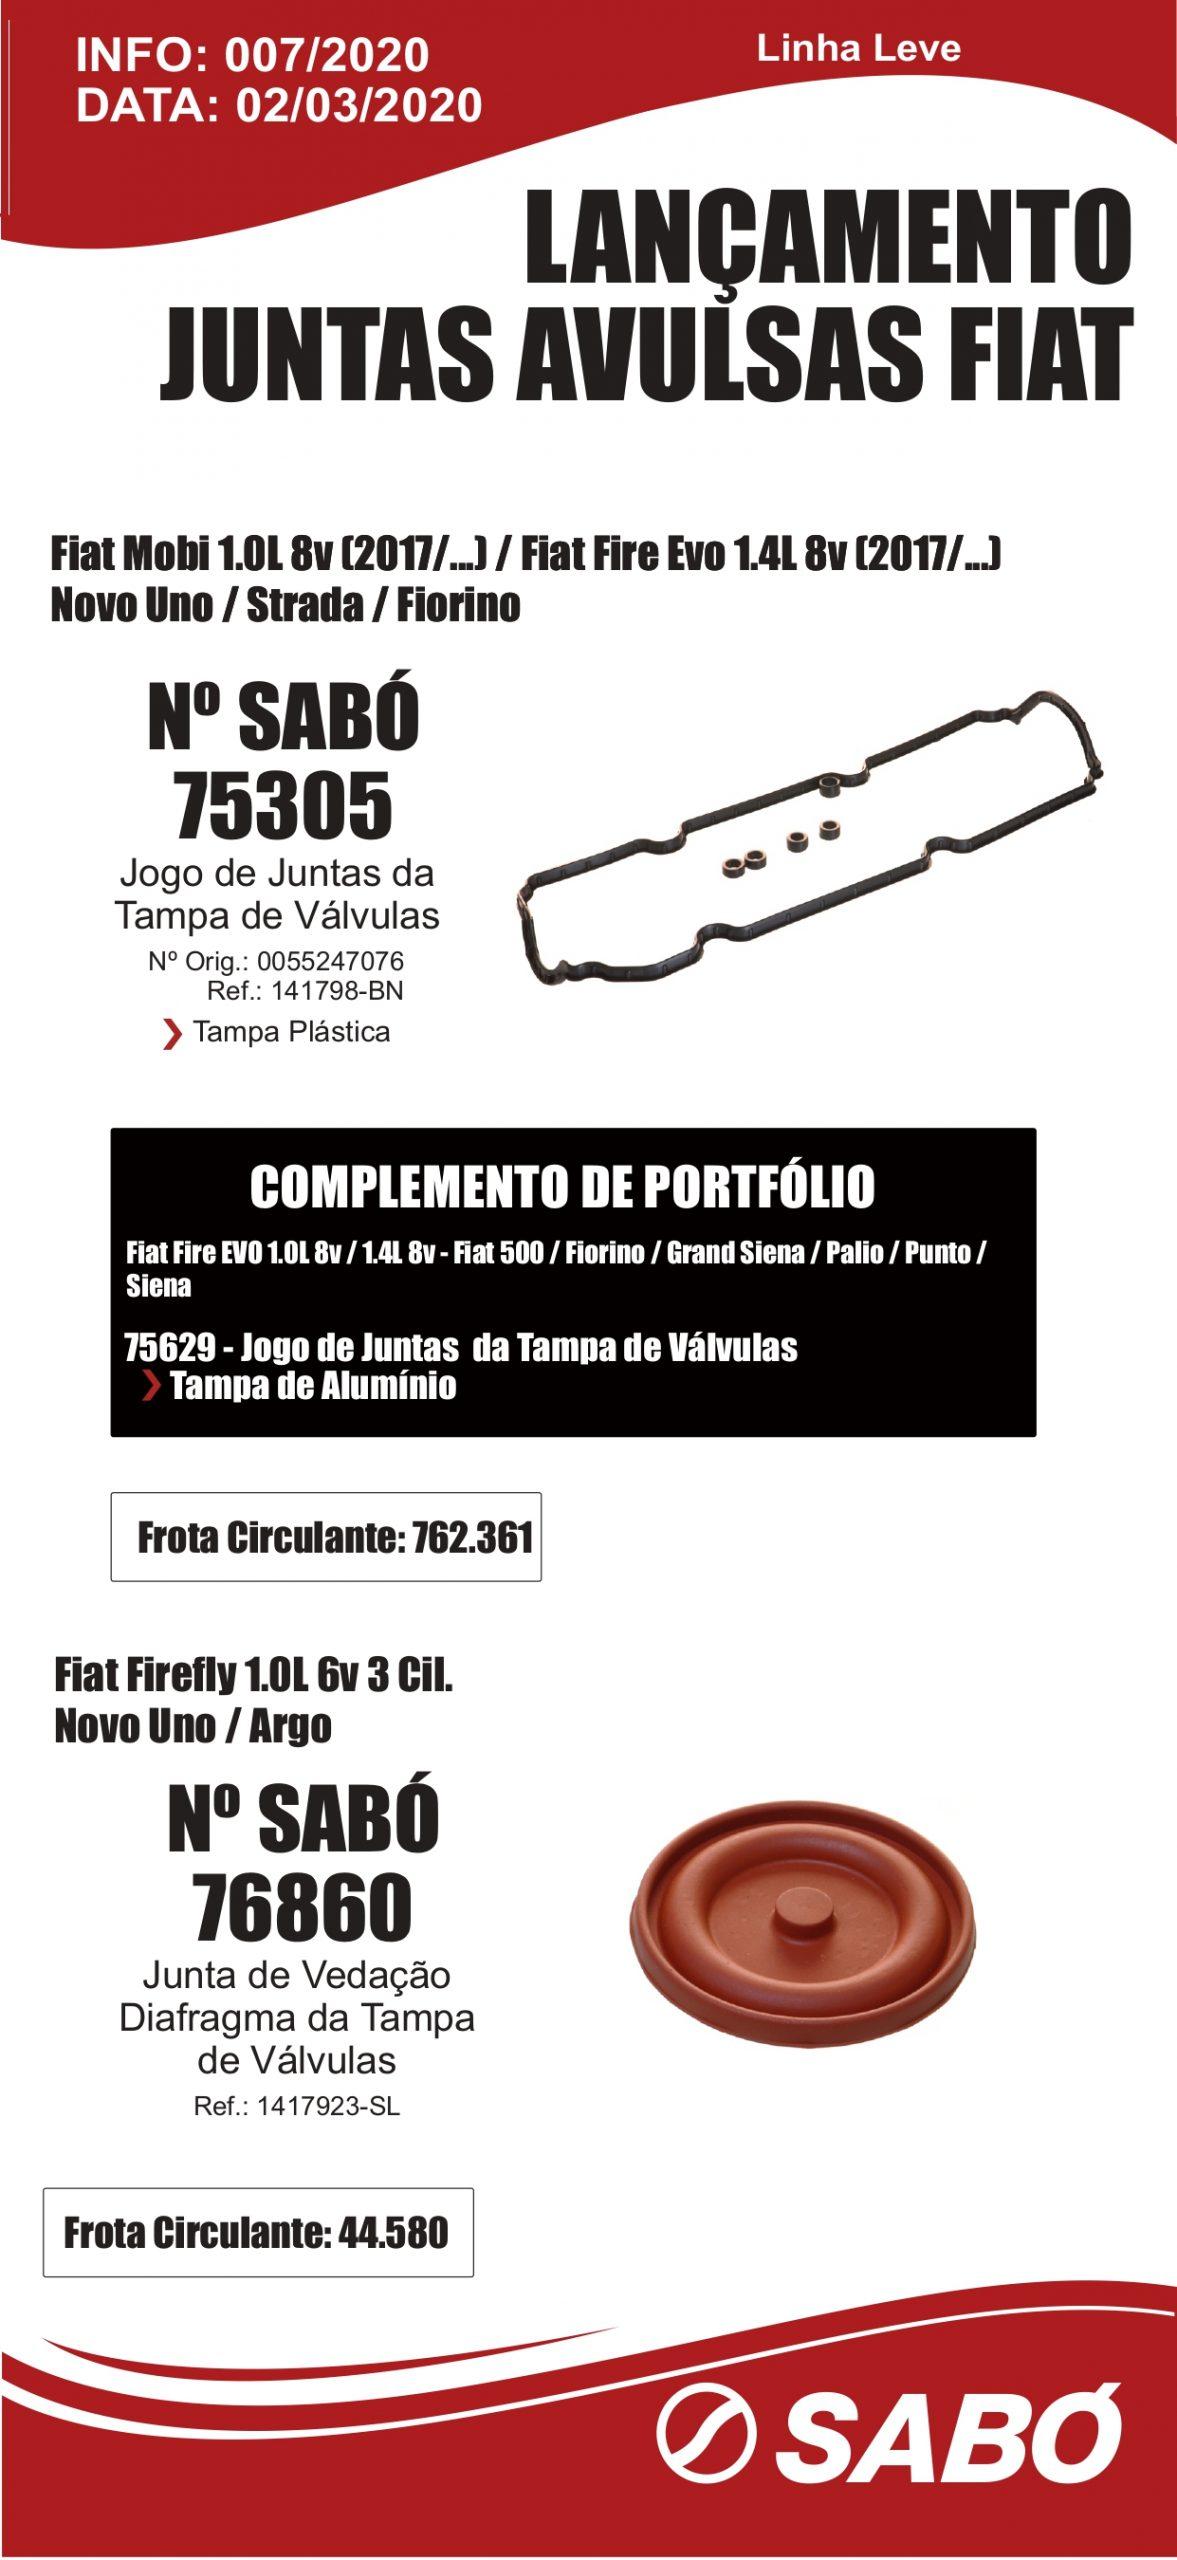 Info_007__Juntas_Avulsas_Fiat_page-0001